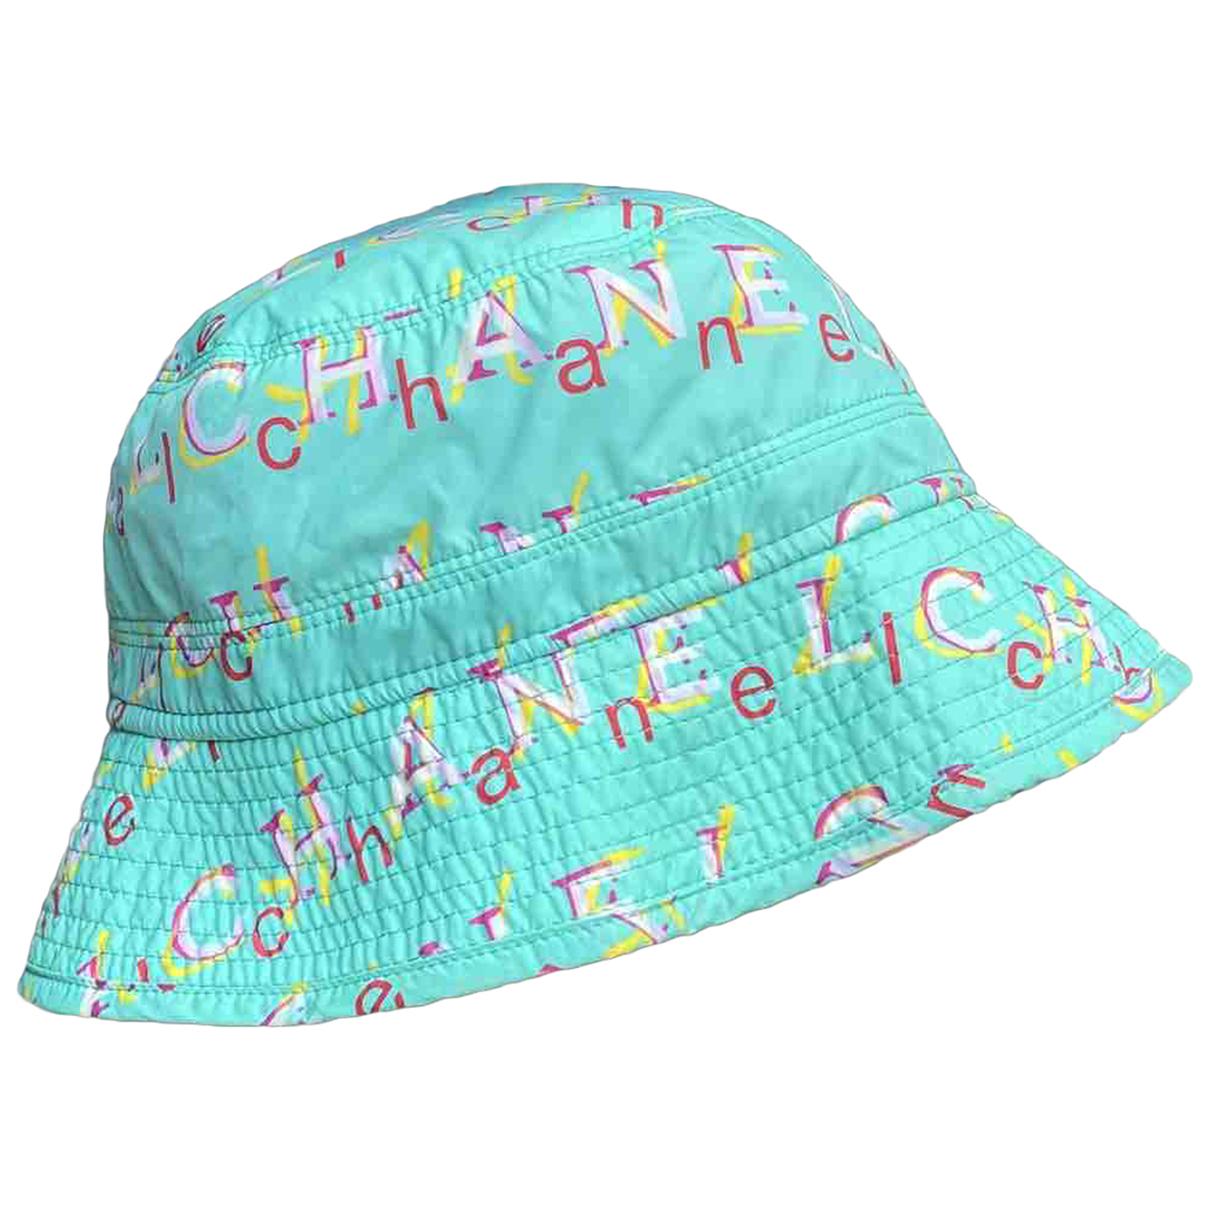 Chanel \N Turquoise hat for Women M International